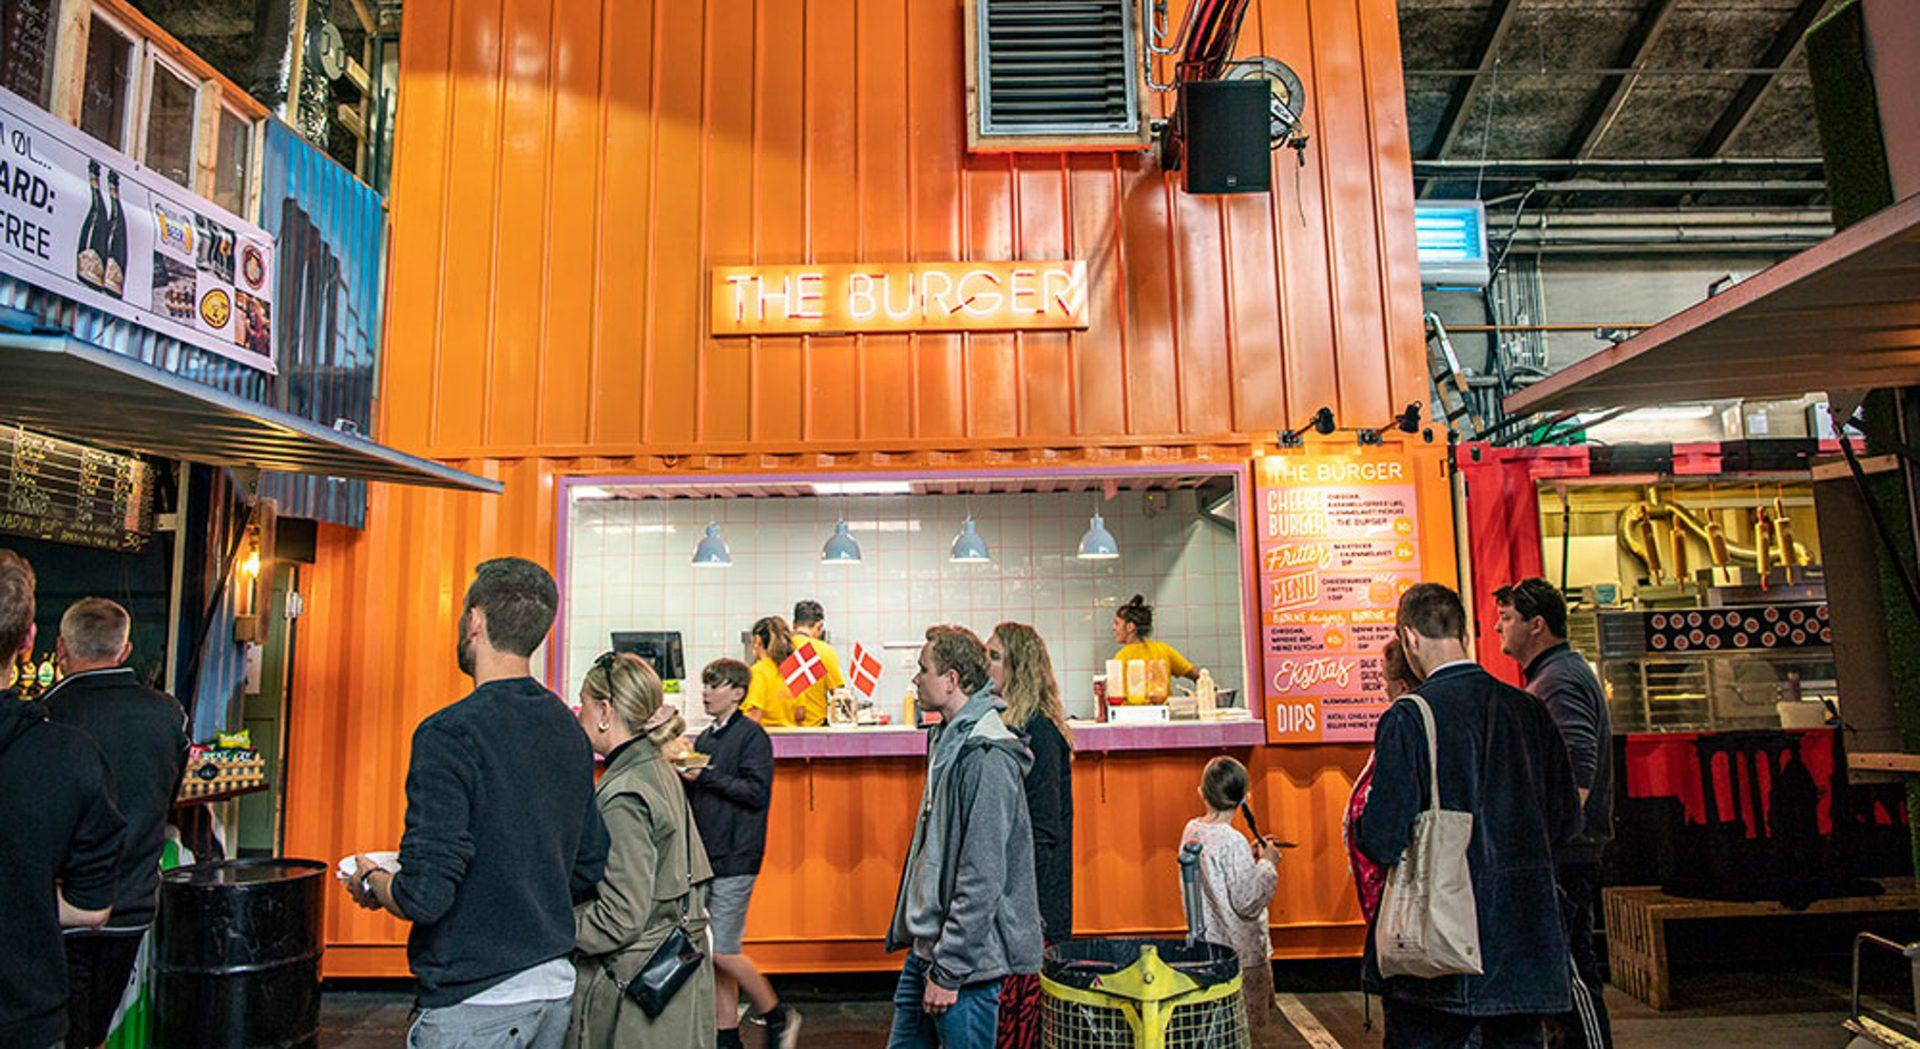 Aarhus Street Food: Nye smash-burgers i garagen